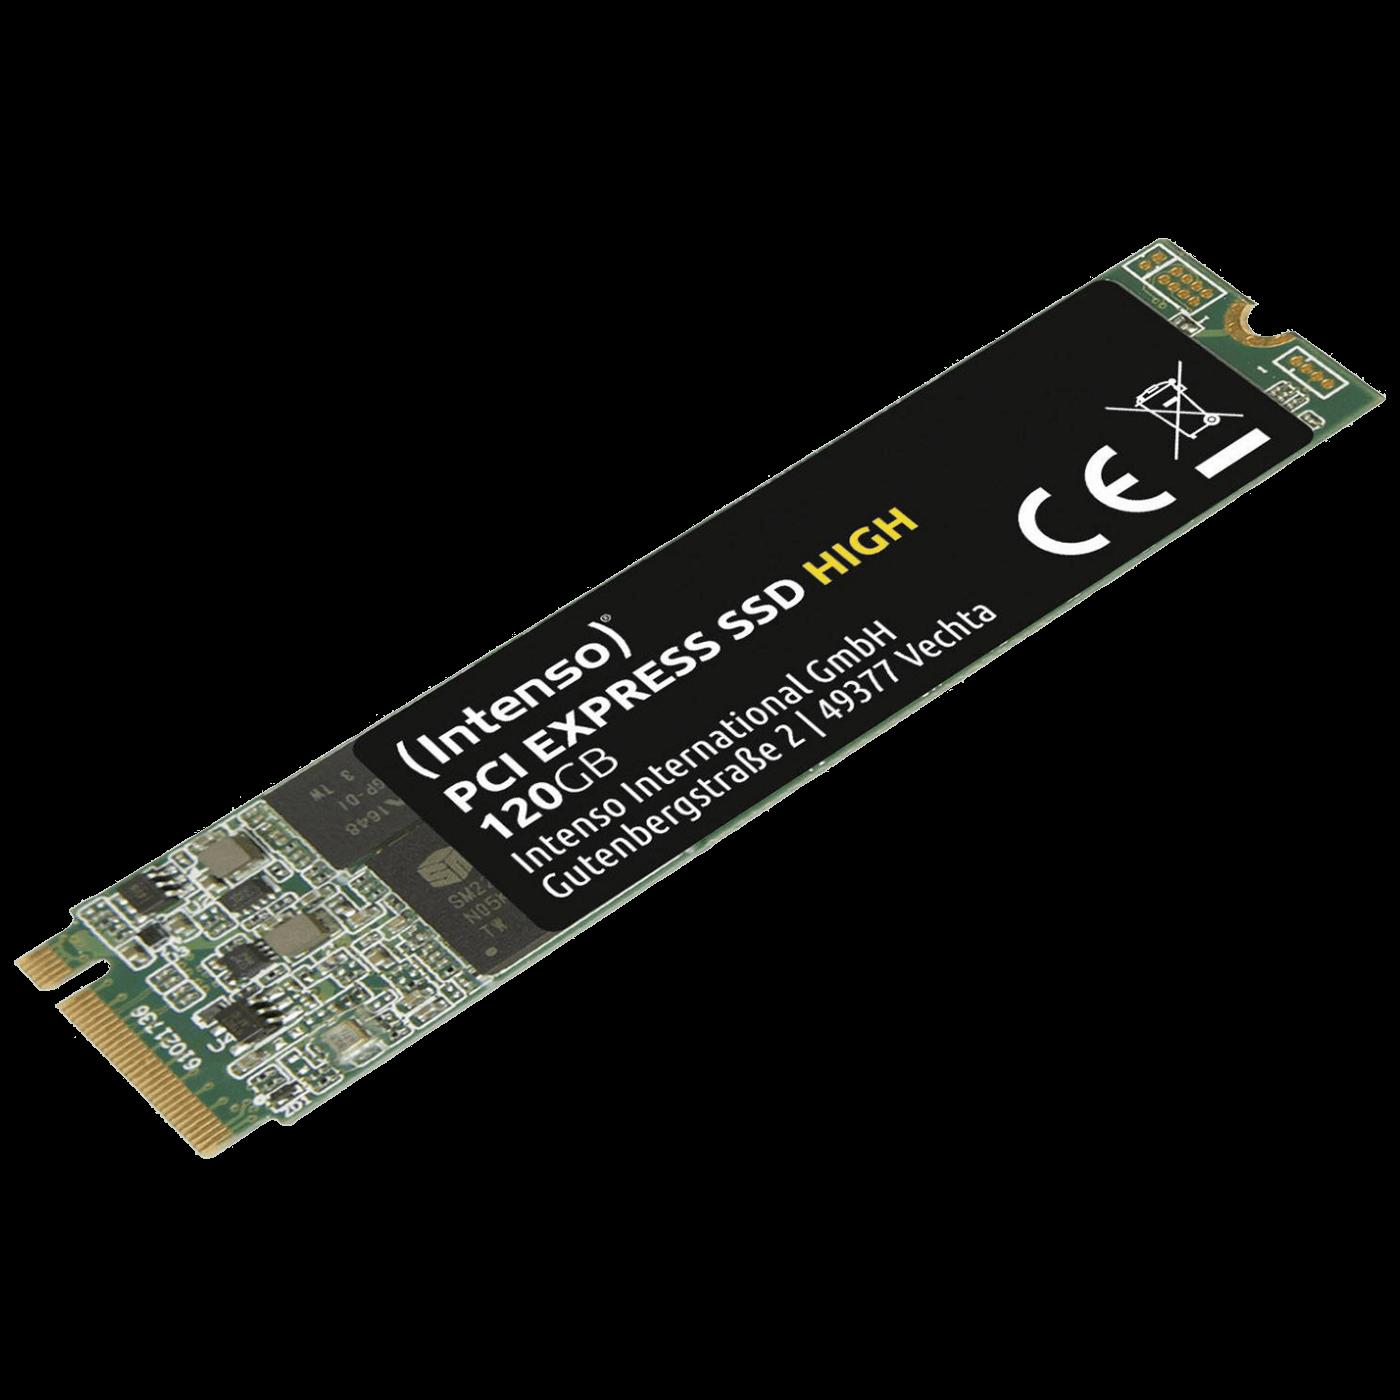 SSD M.2 2280, PCIe, kapacitet 120 GB